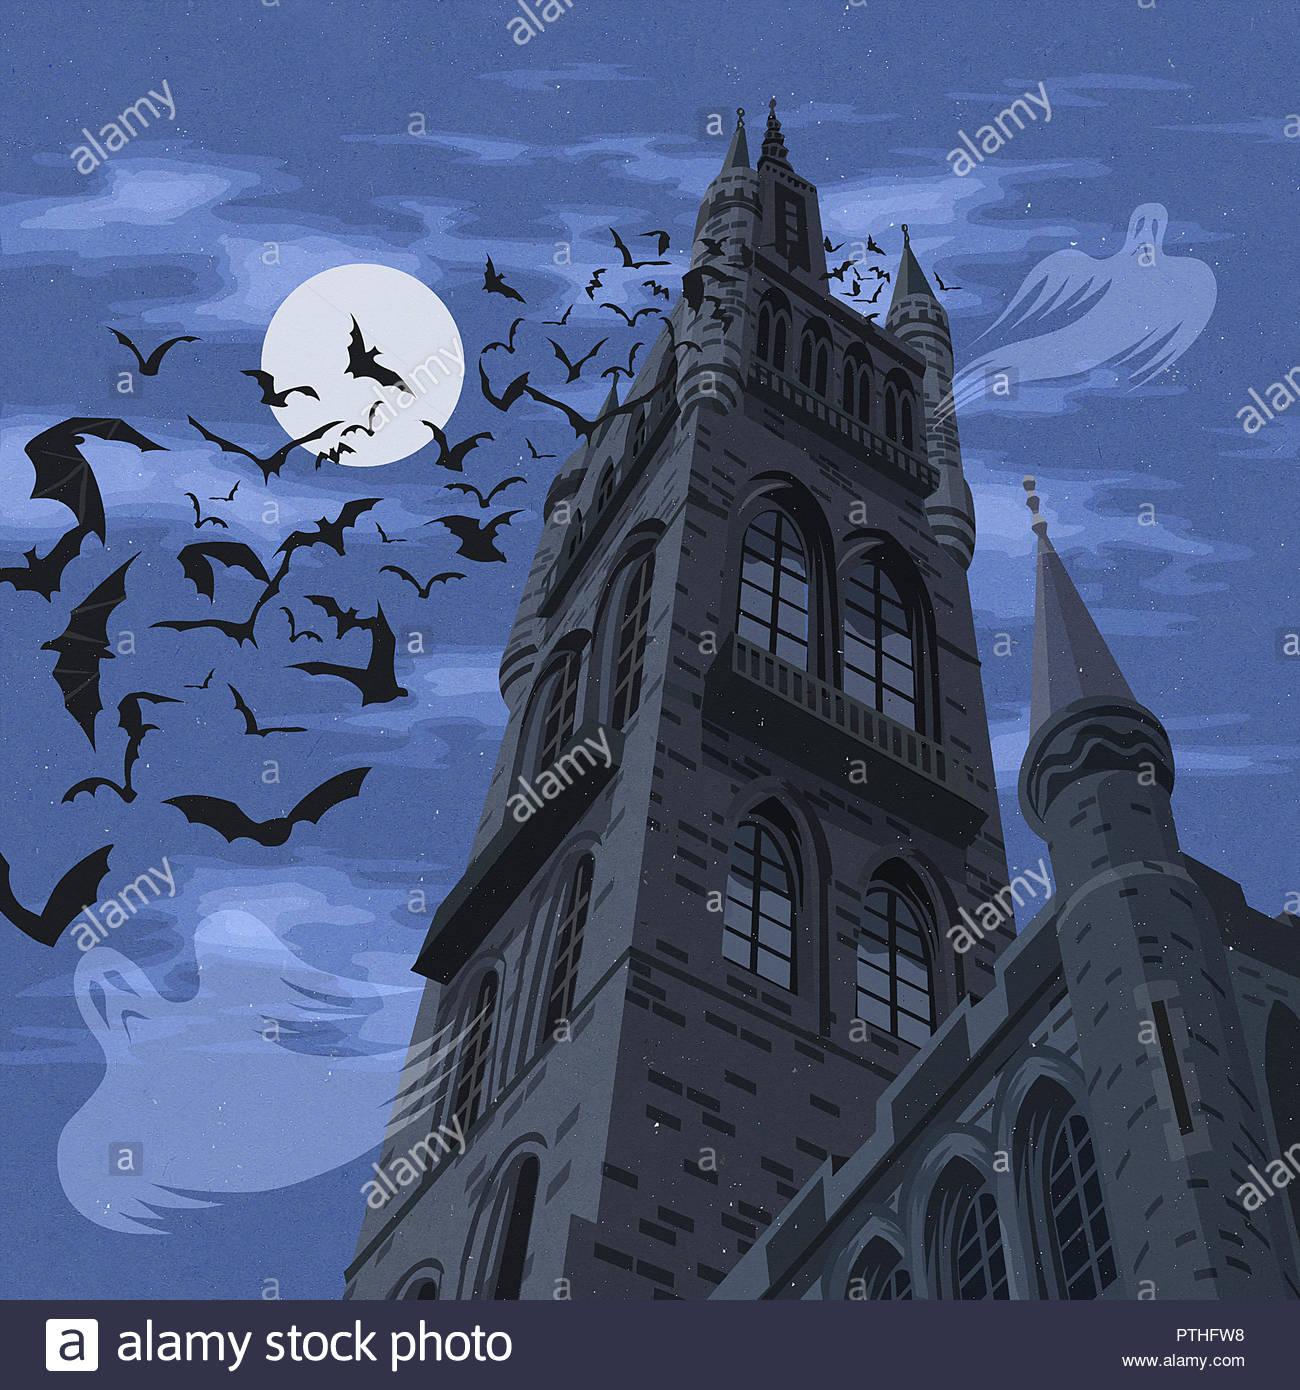 Spooky haunted castle - Stock Image